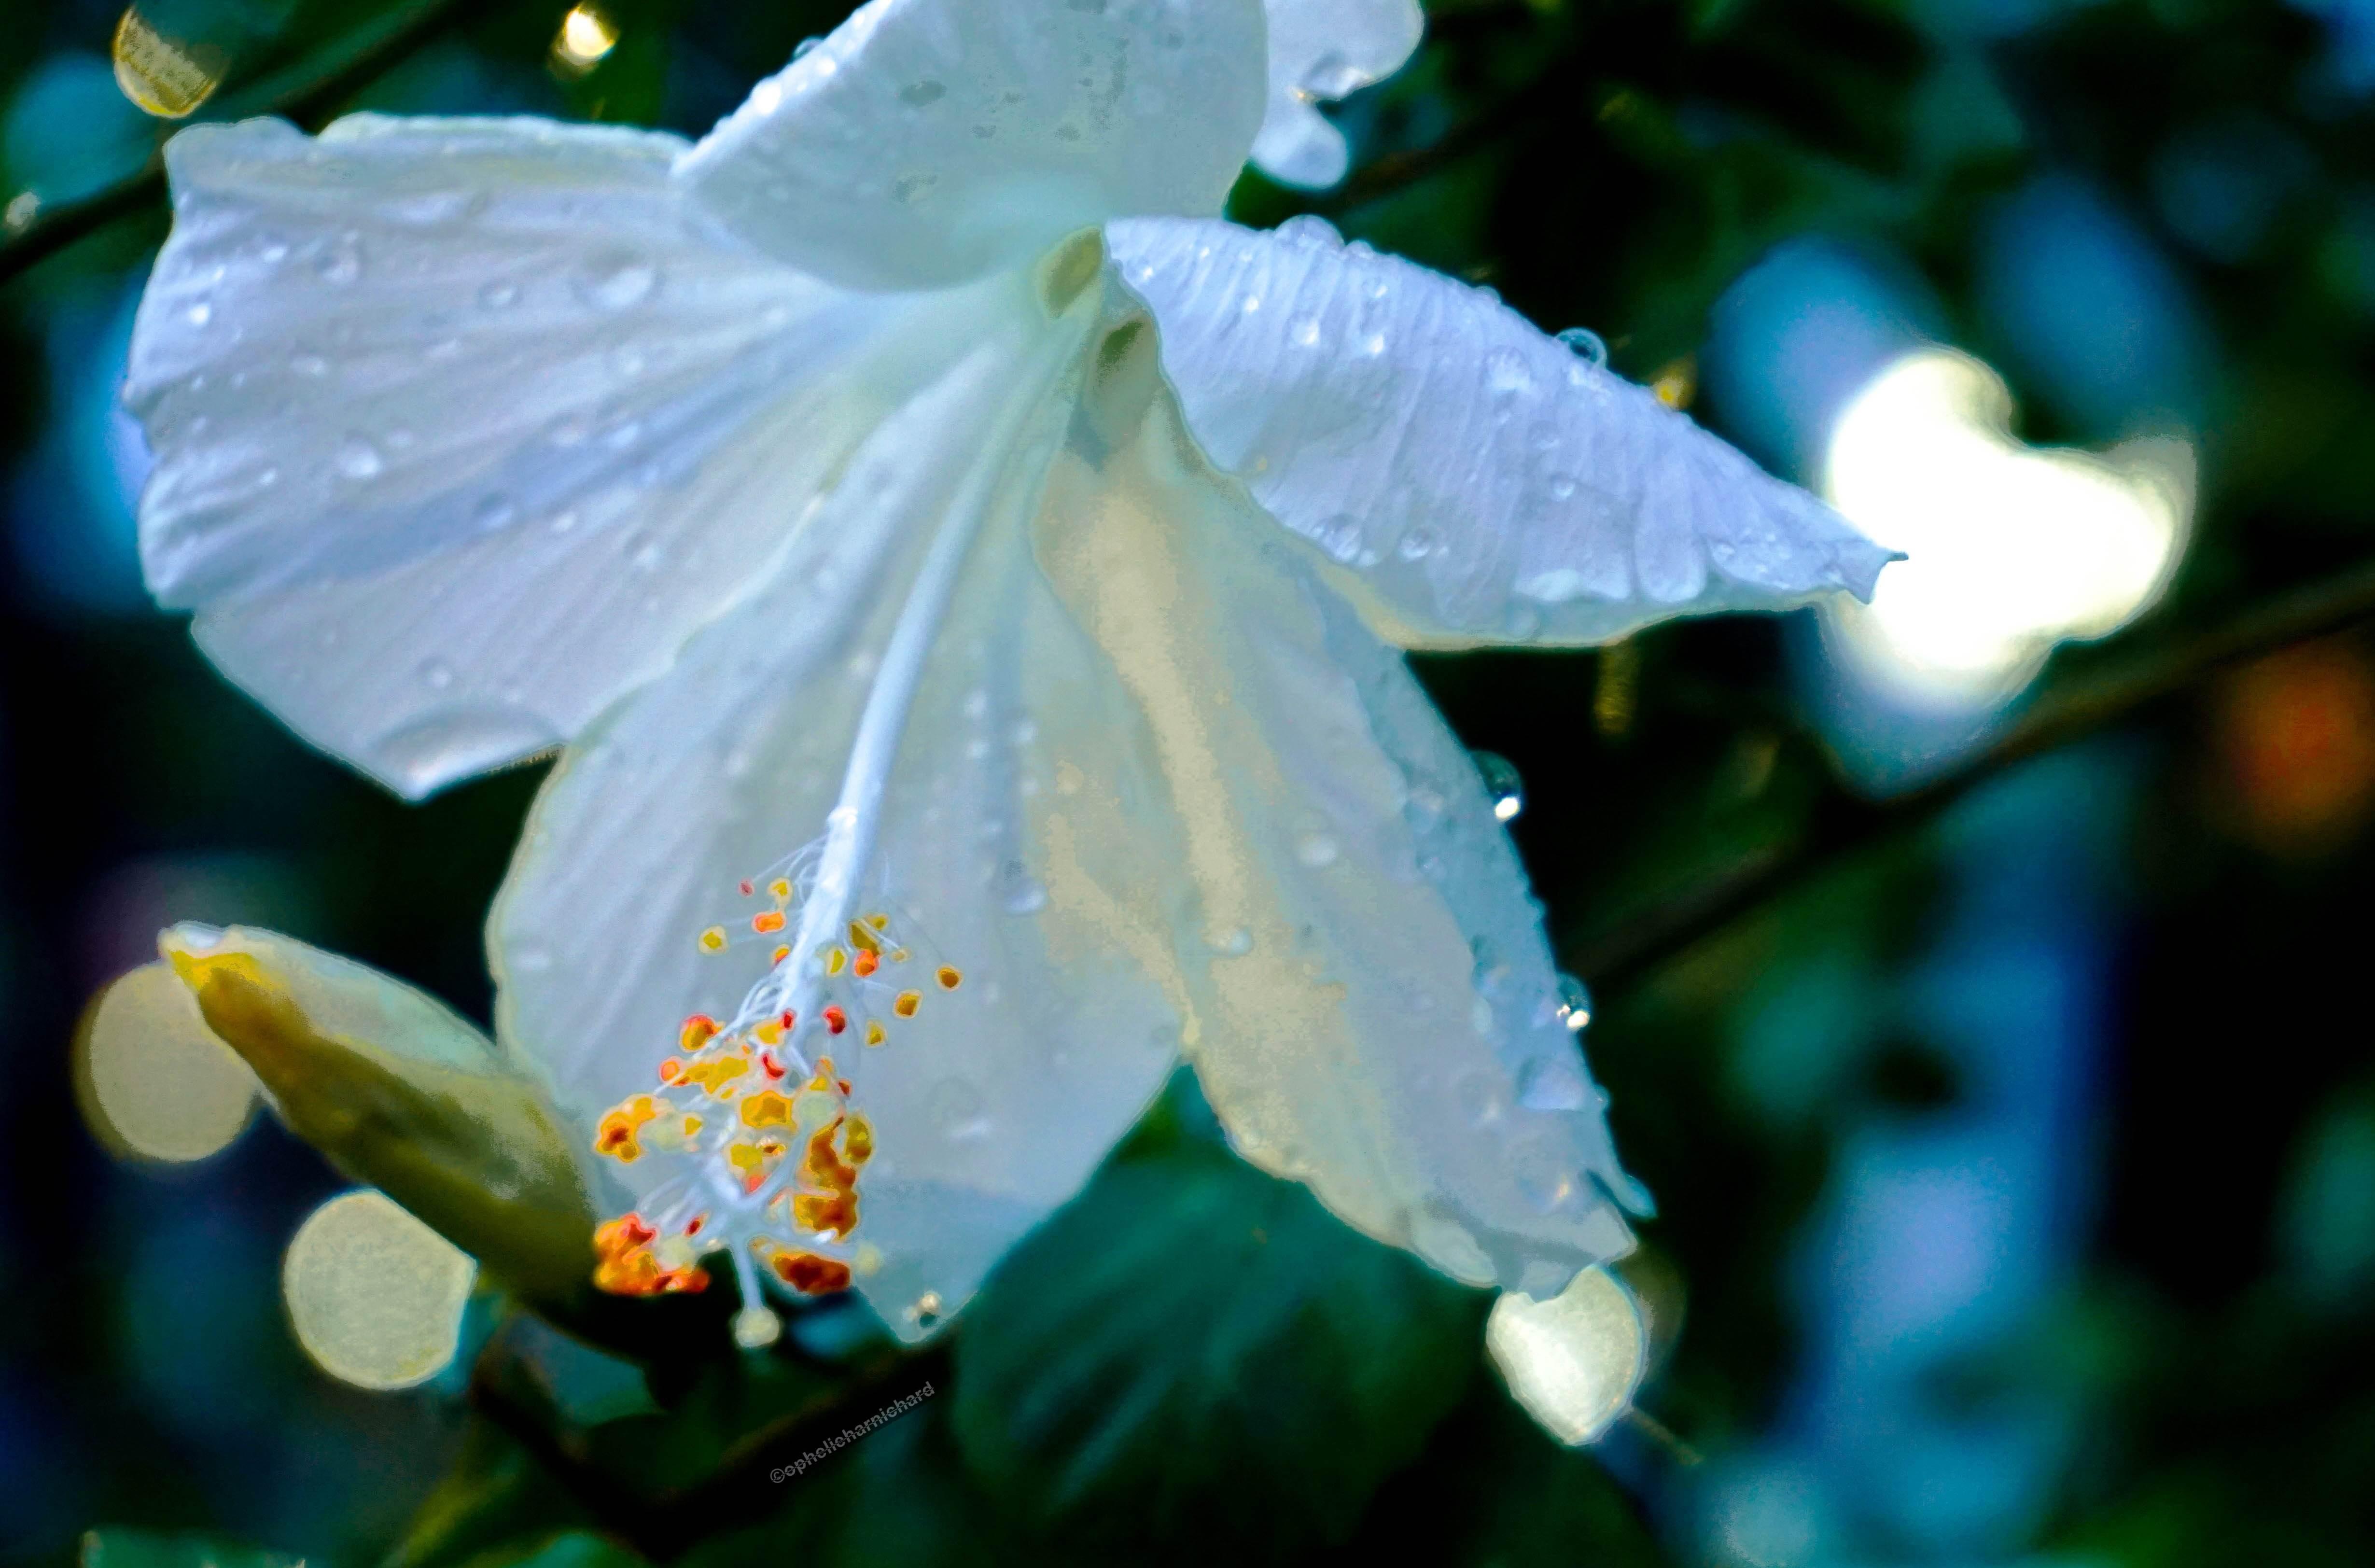 Travel-photography-gallery-closeup-flower-lights-blur-Cambodia